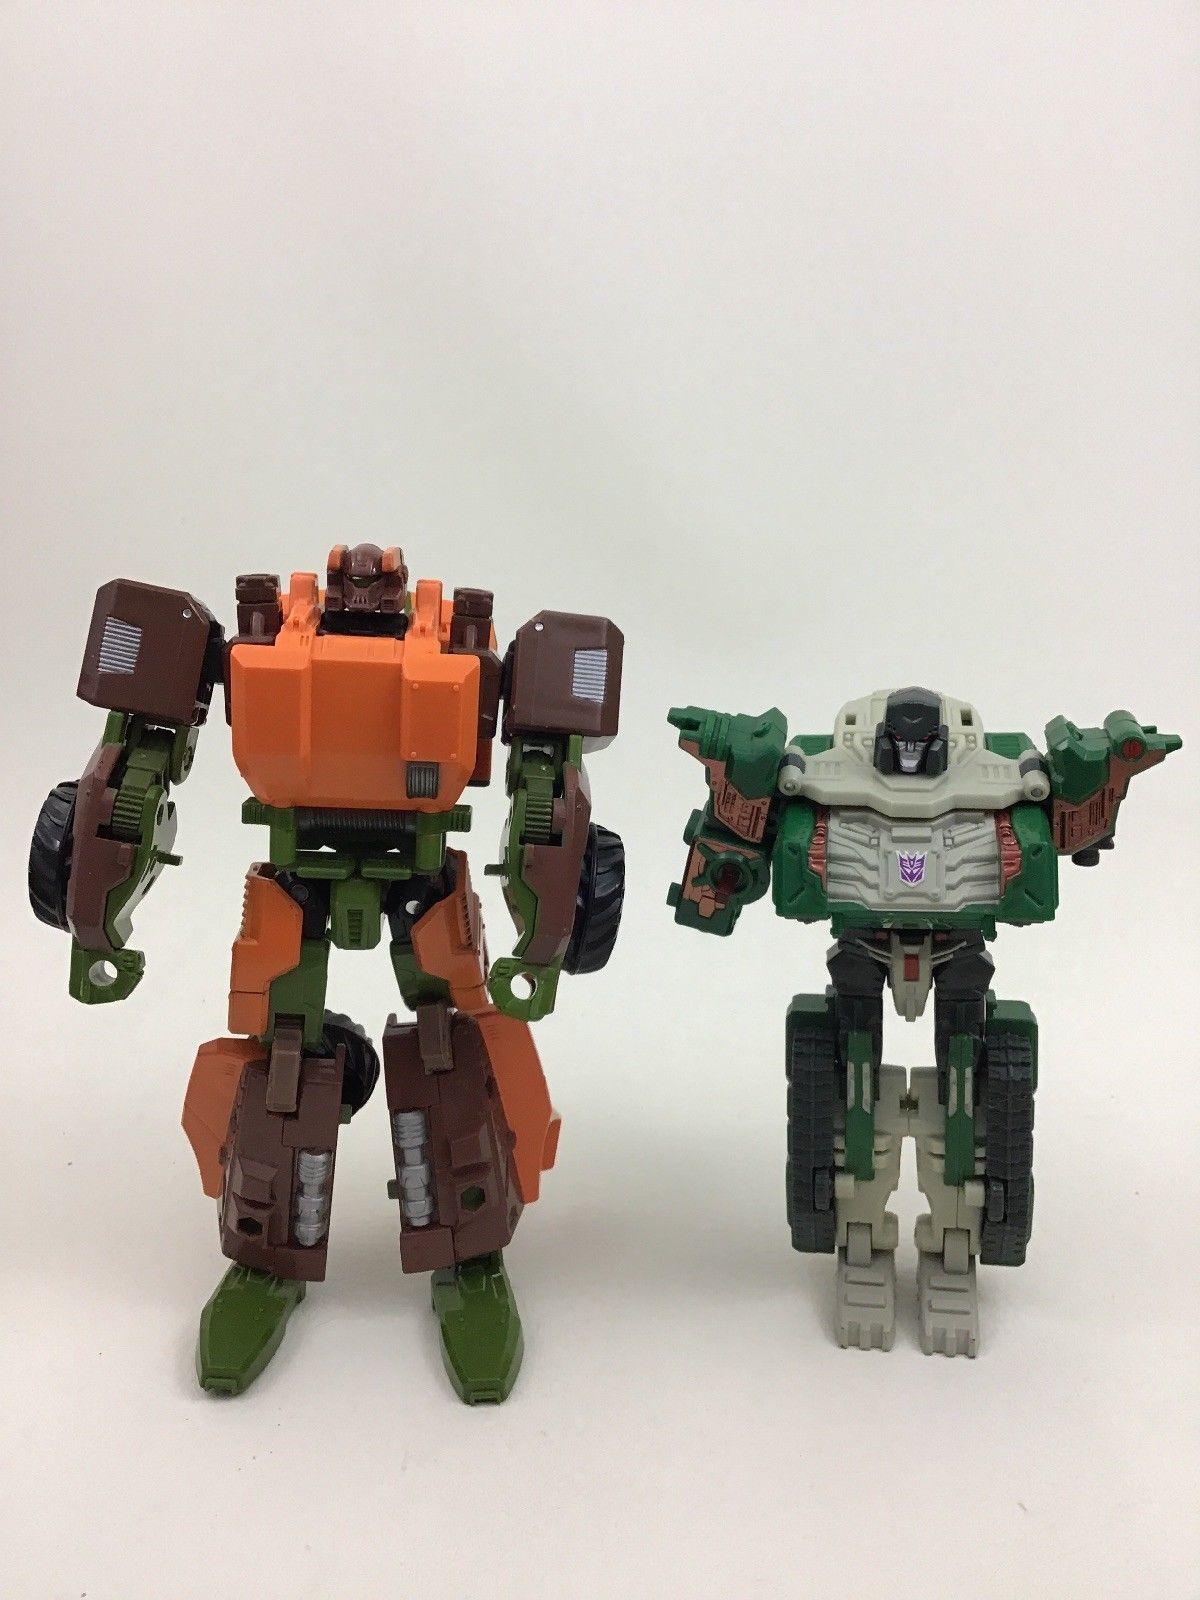 Transformers Lot Autobots Decepticons 11pcs Toy Figures Vehicles Parts Hasbro A7